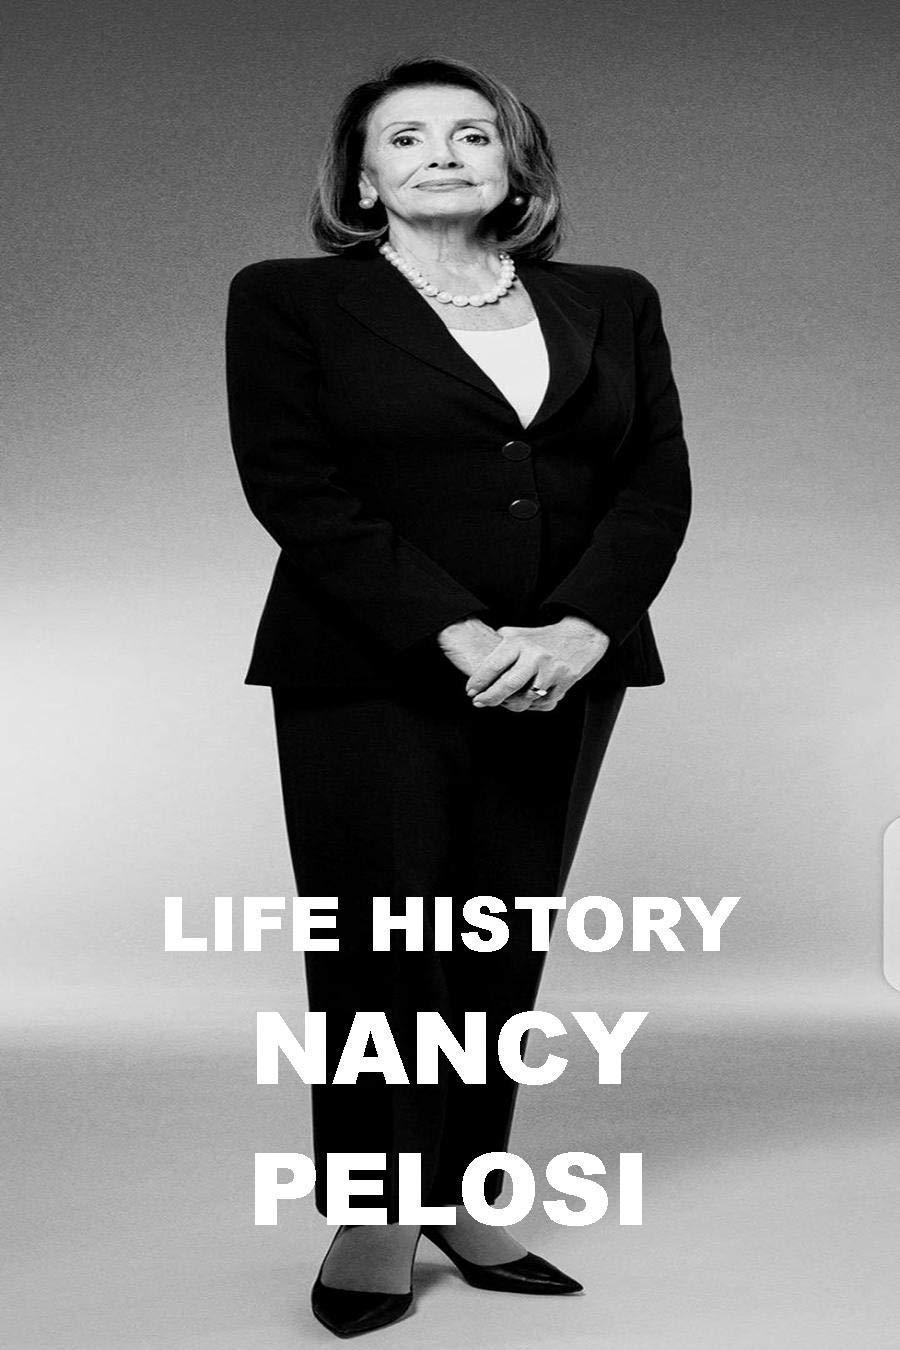 LIFE HISTORY - NANCY PELOSI